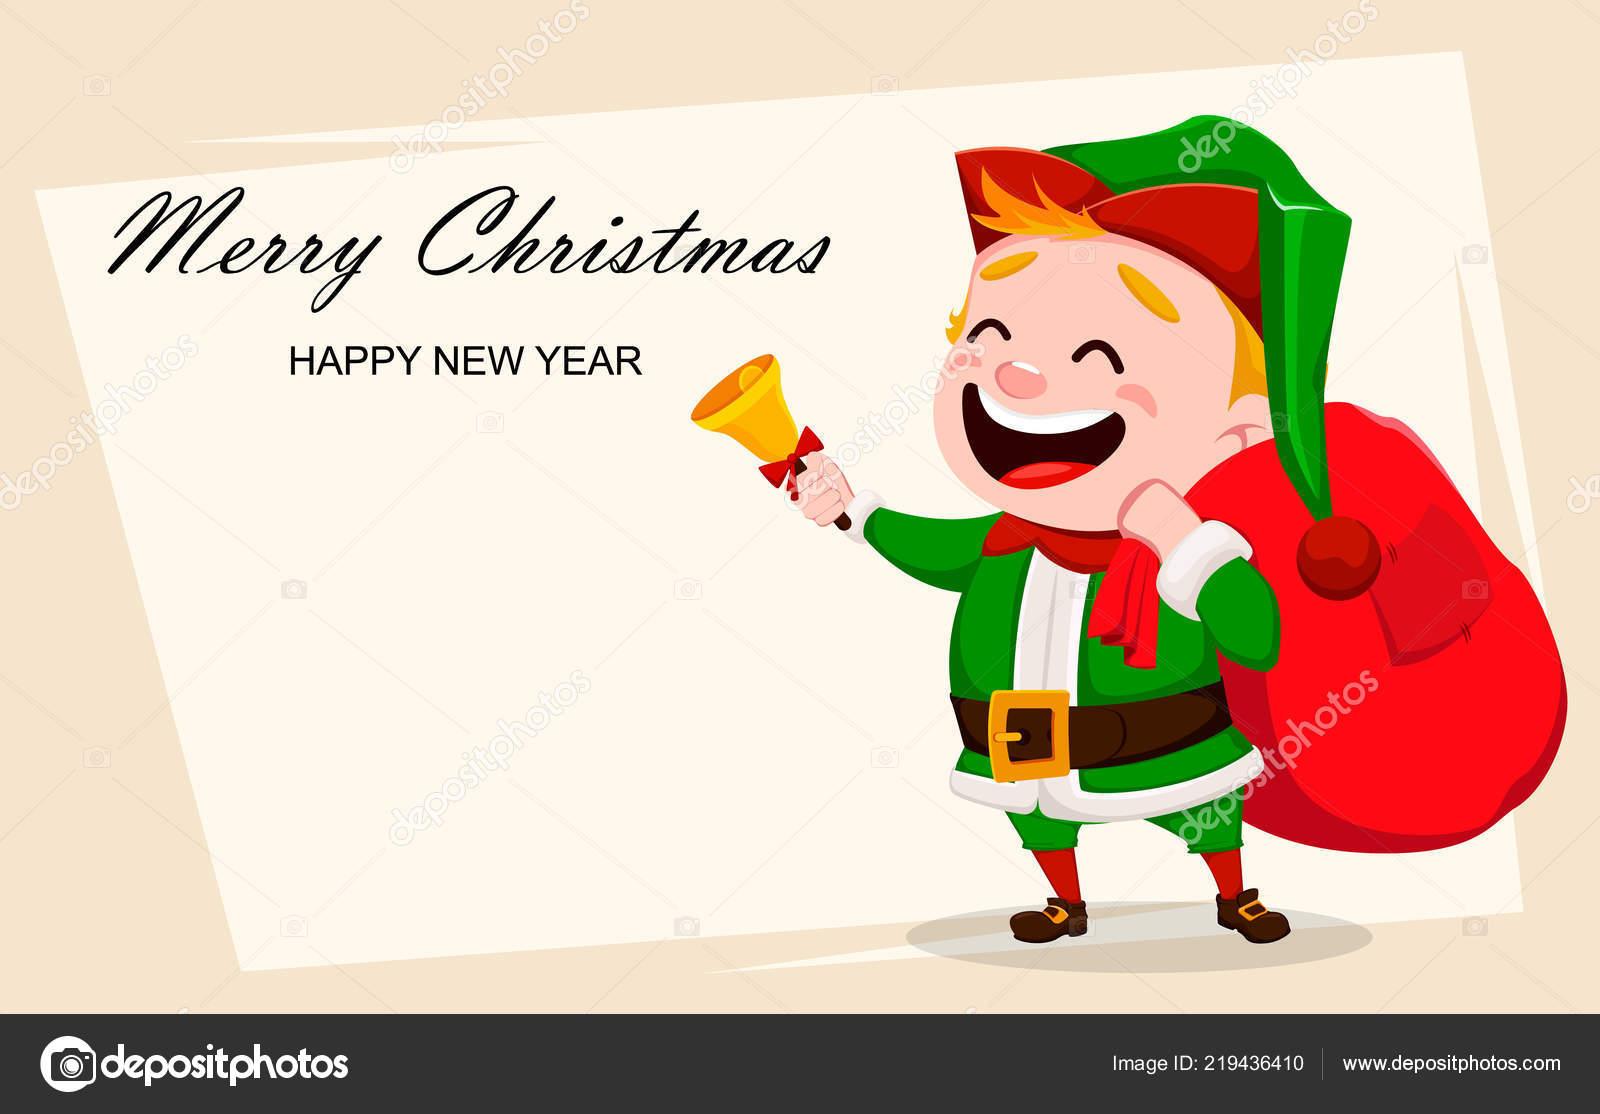 Merry Christmas Greeting Card Funny Santa Claus Helper Cheerful Cute ...